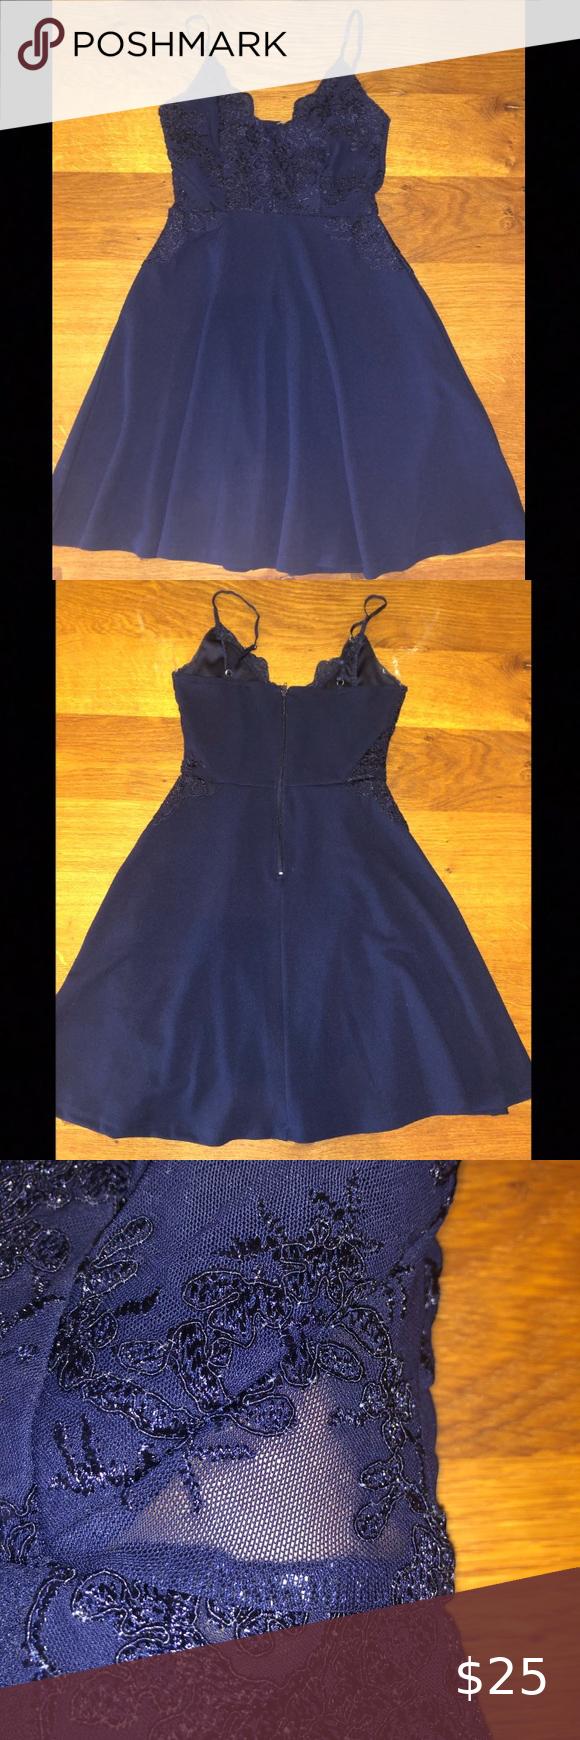 Windsor Navy Blue Homecoming Dress Size Xs Blue Homecoming Dresses Navy Blue Homecoming Dress Homecoming Dresses [ 1740 x 580 Pixel ]